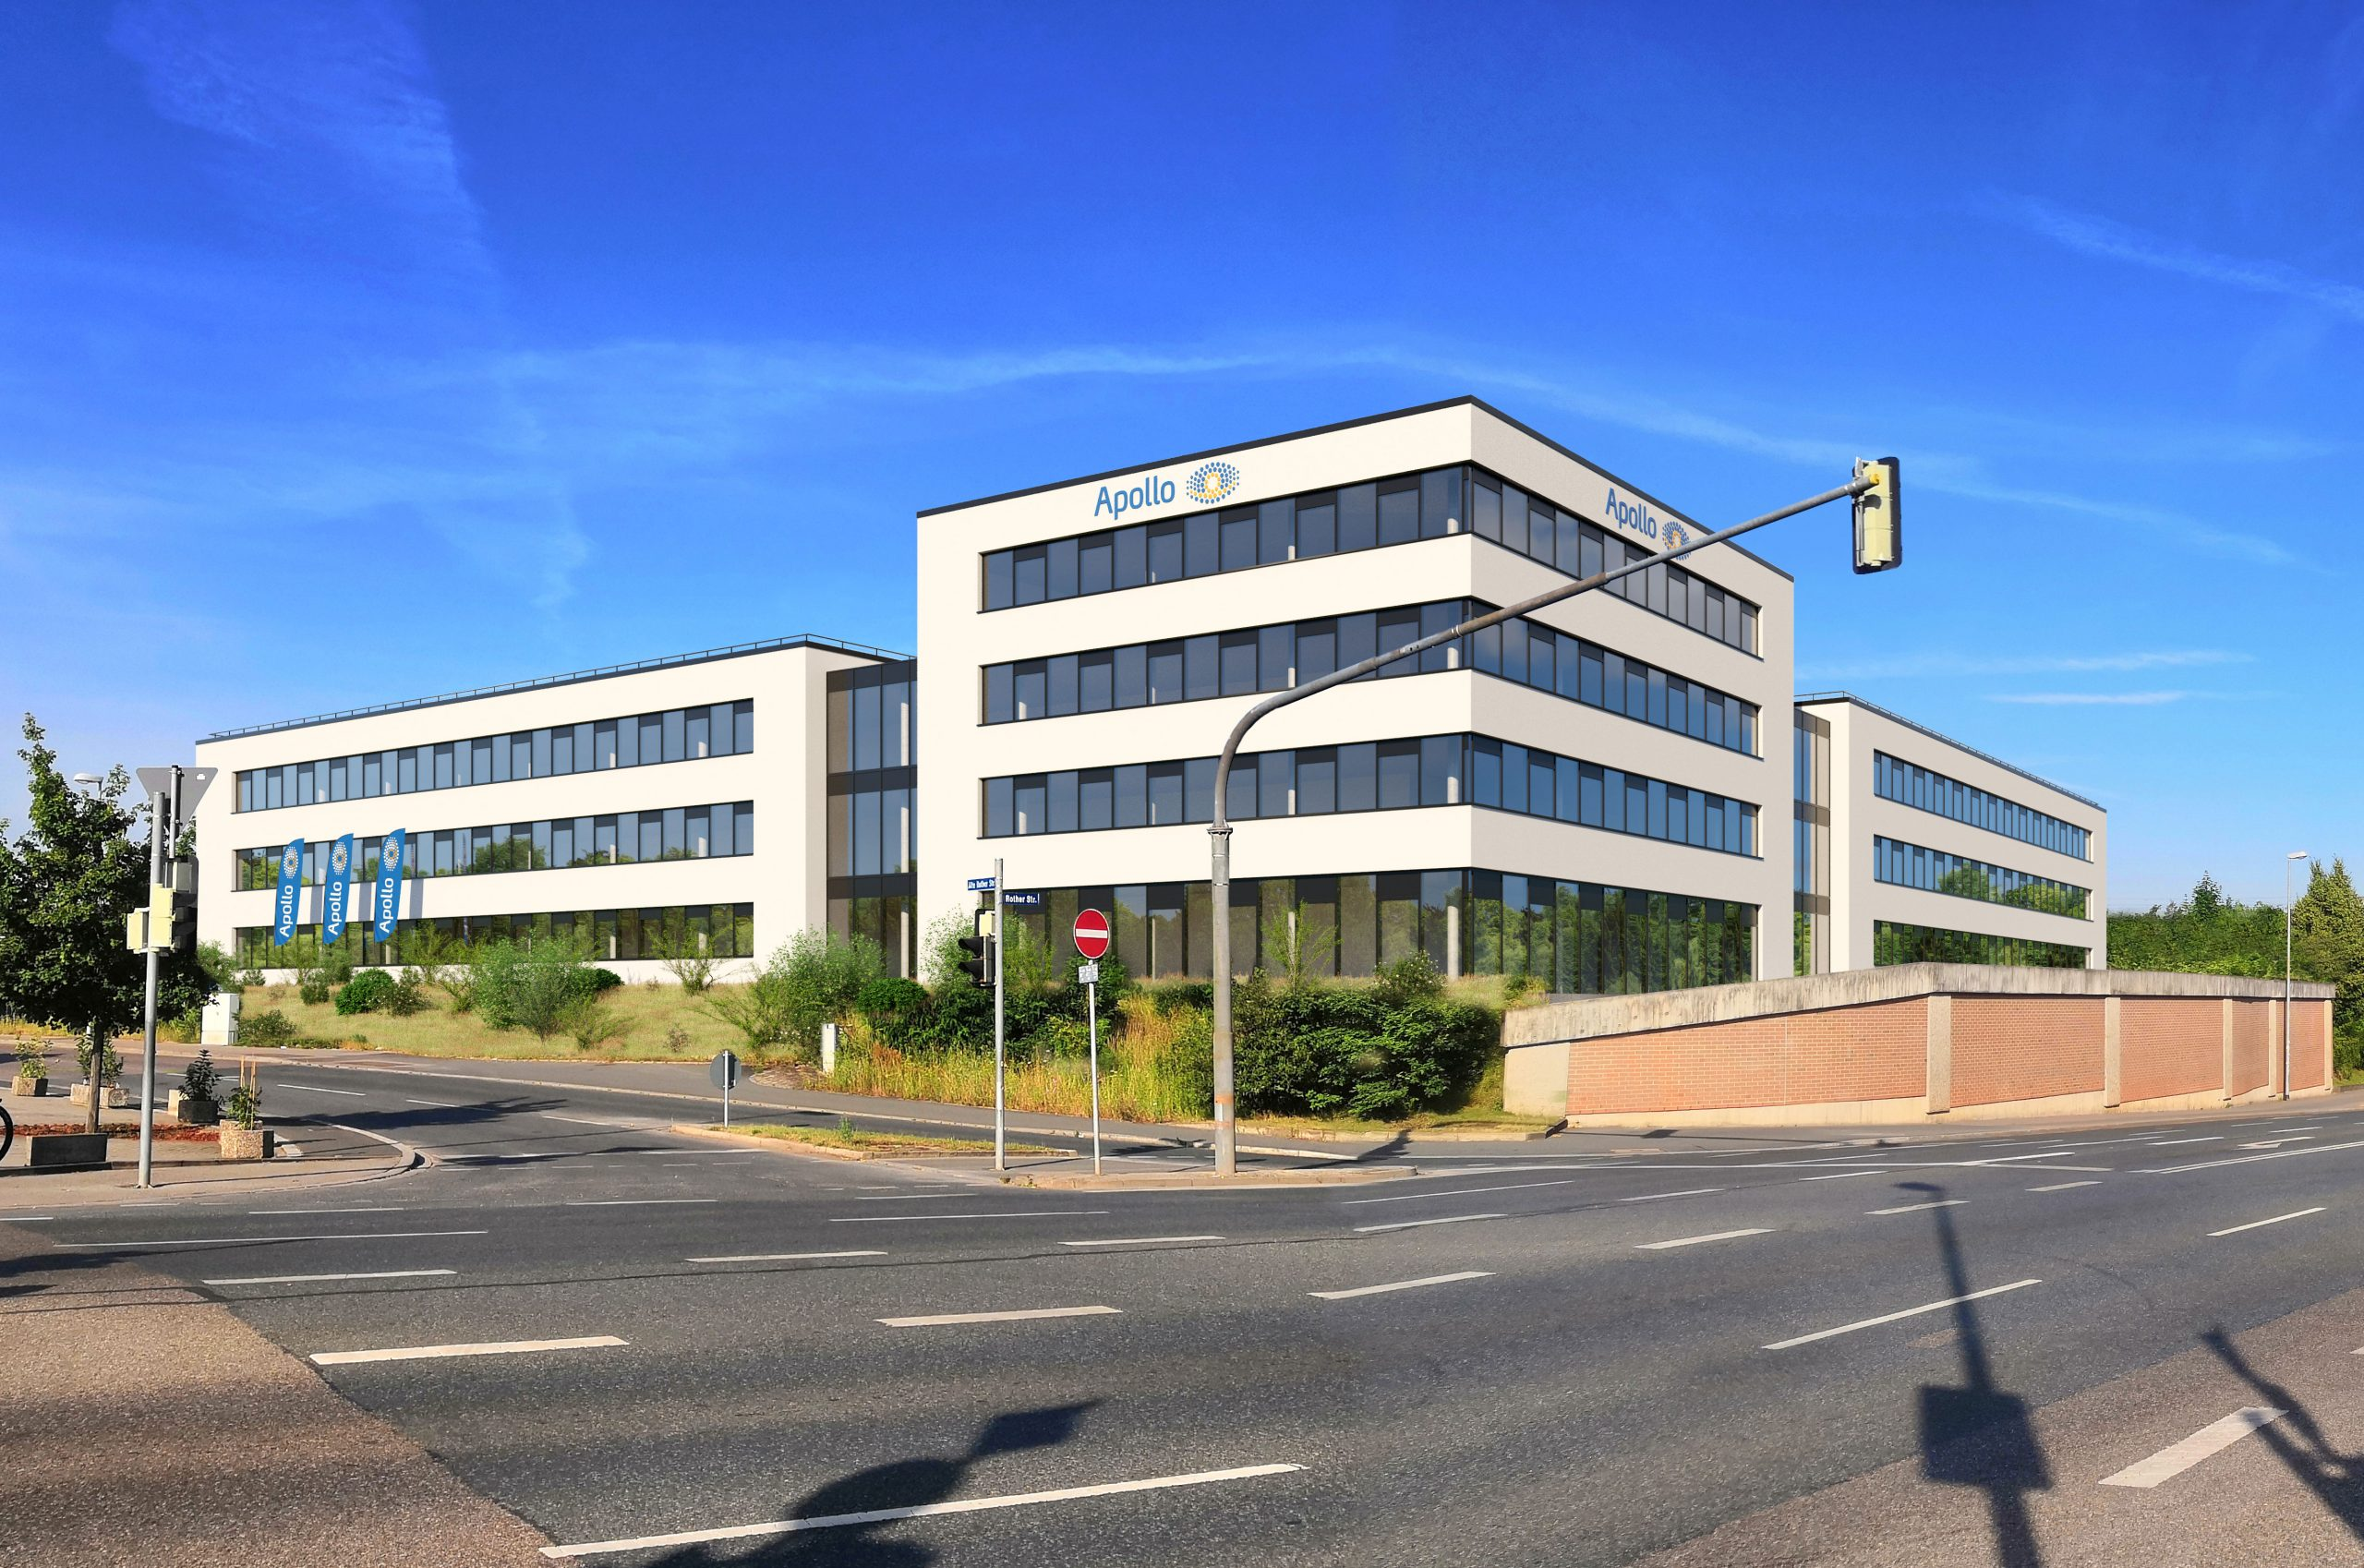 Projektentwiclung + Planung Headquarter Apollo in Schwabach